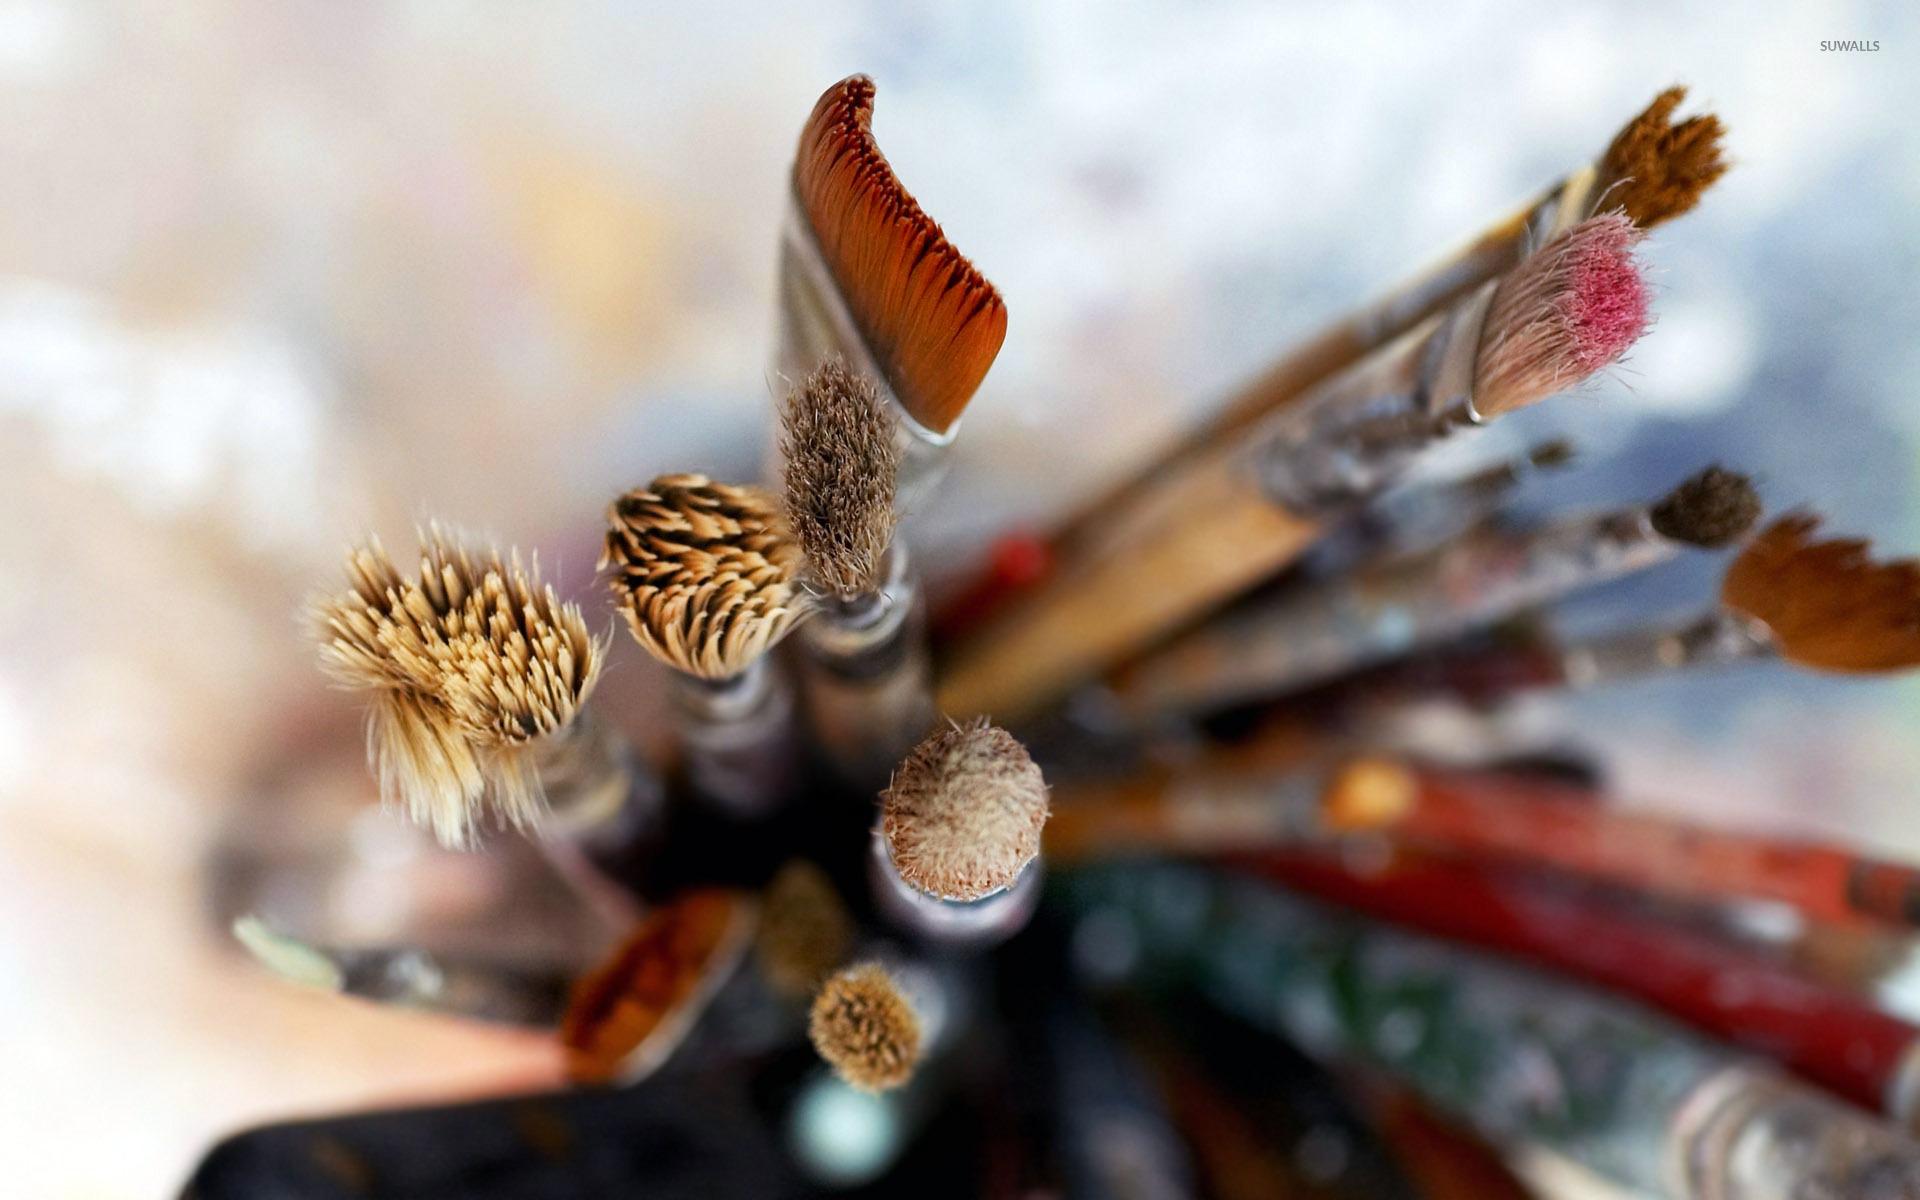 Ipad Retina Wallpaper Art Pain Brush: Photography Wallpapers